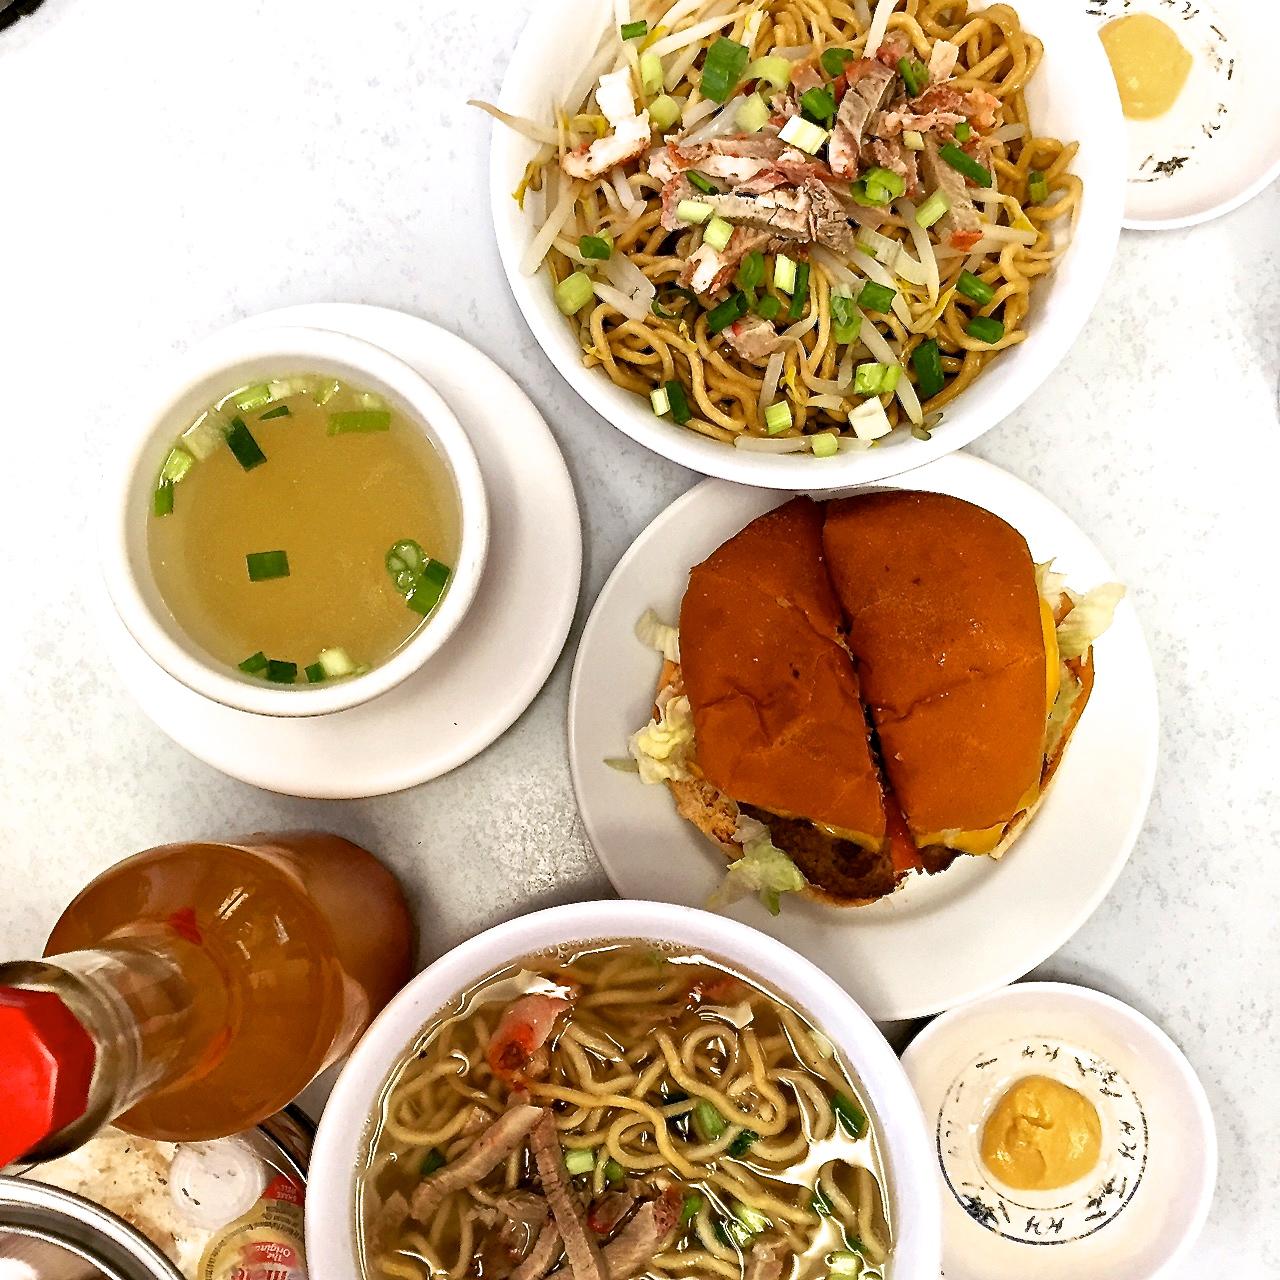 Best Saimin noodles (Hawaiian ramen) at ' Sam Sotos' -Maui!